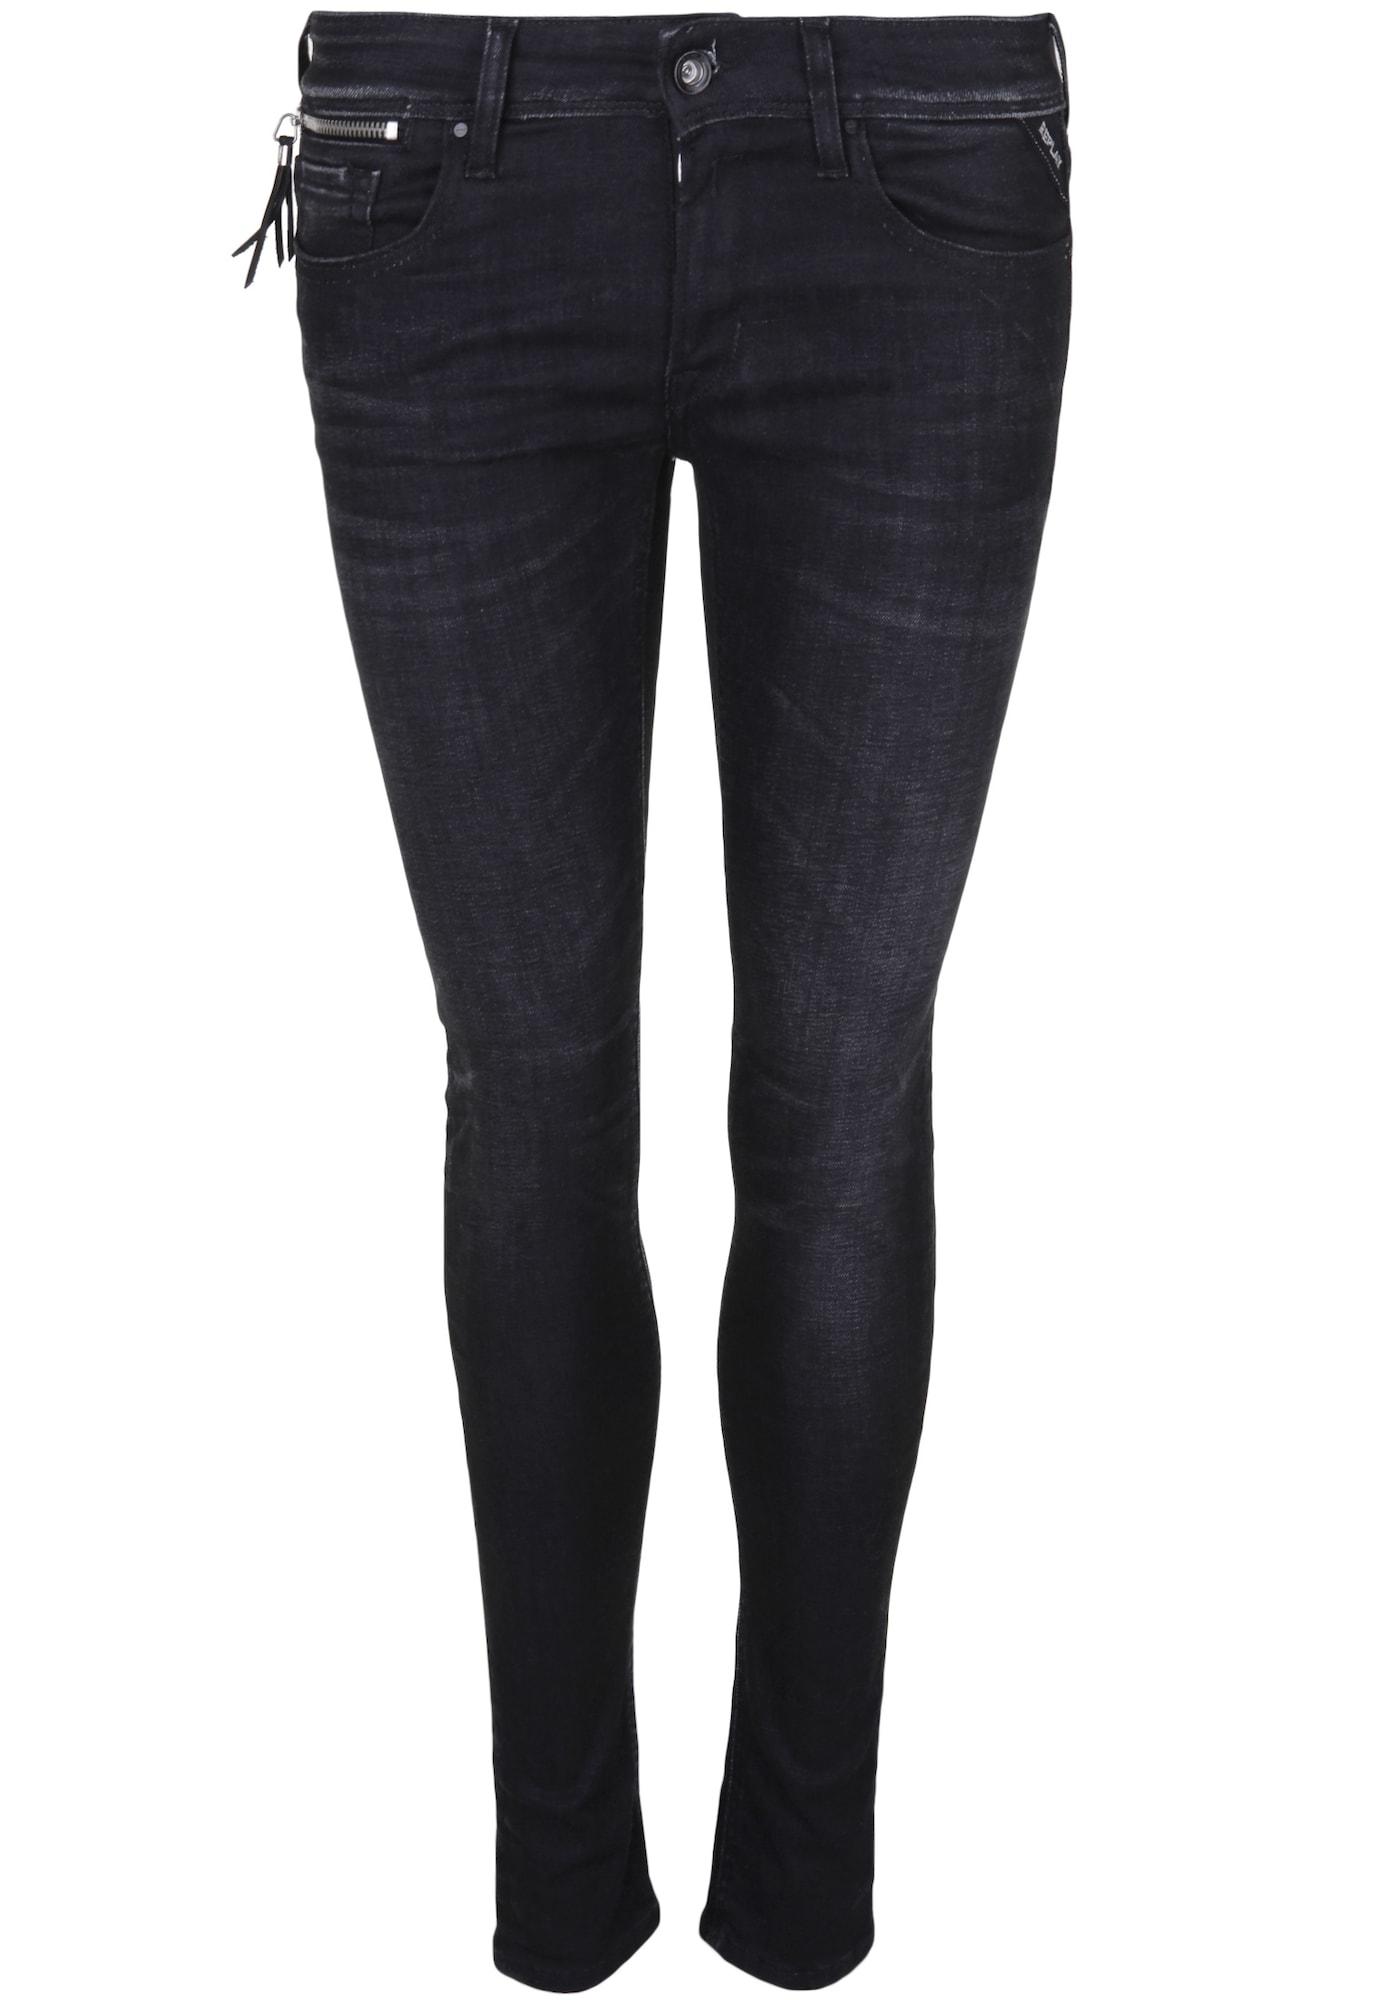 REPLAY Dames Jeans LUZ COIN ZIP black denim